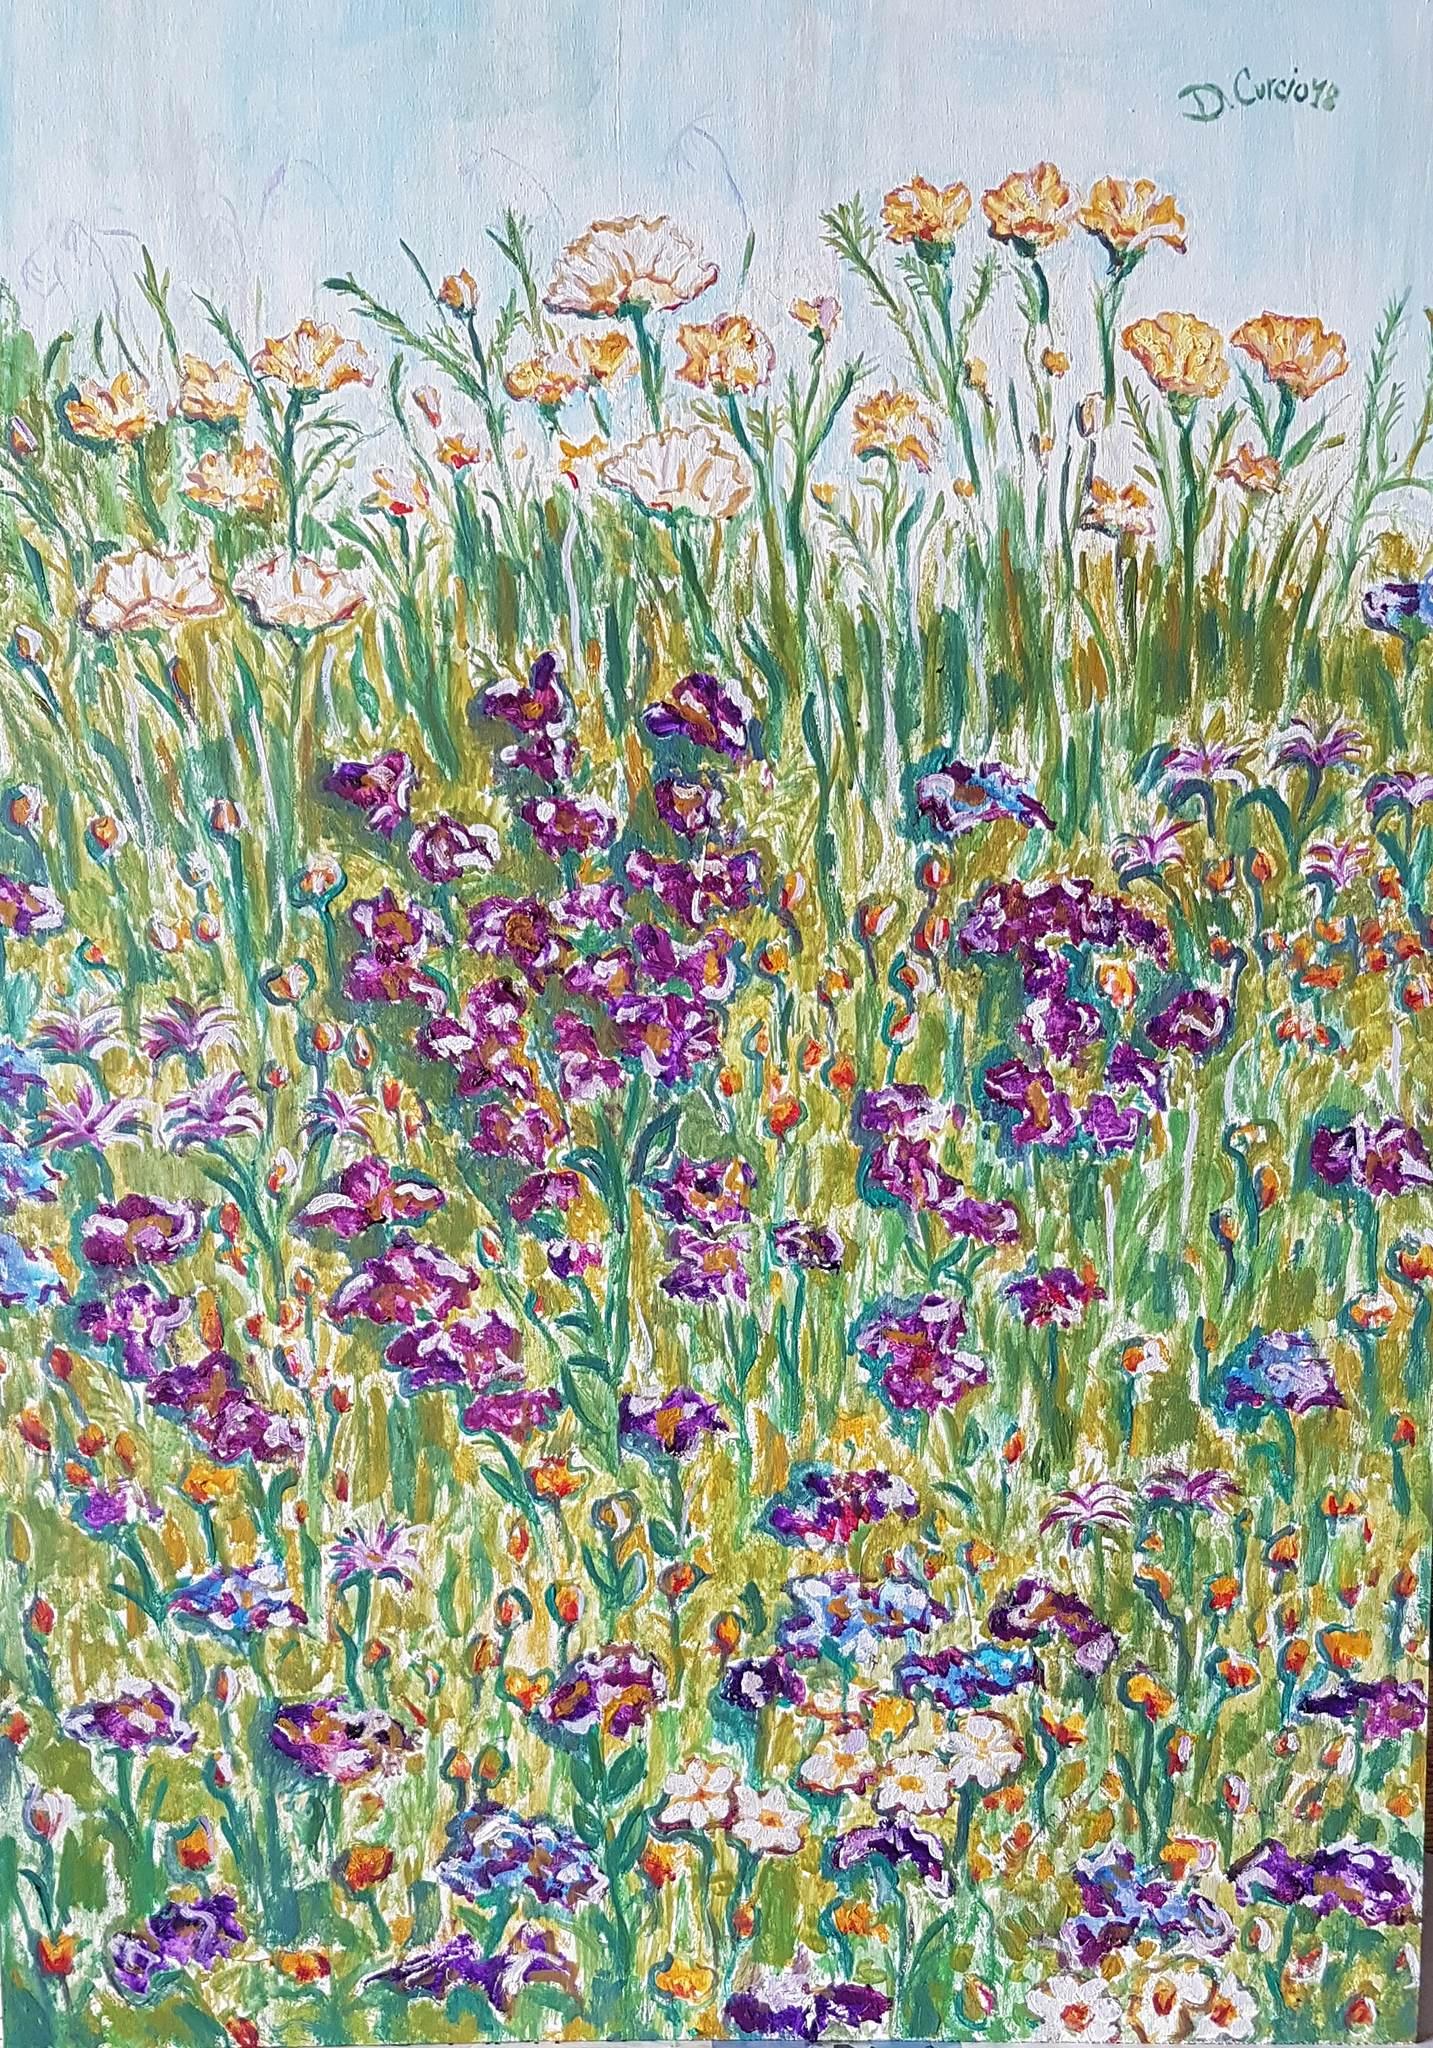 Dancing flowers, dipinto di Donatella Curcio